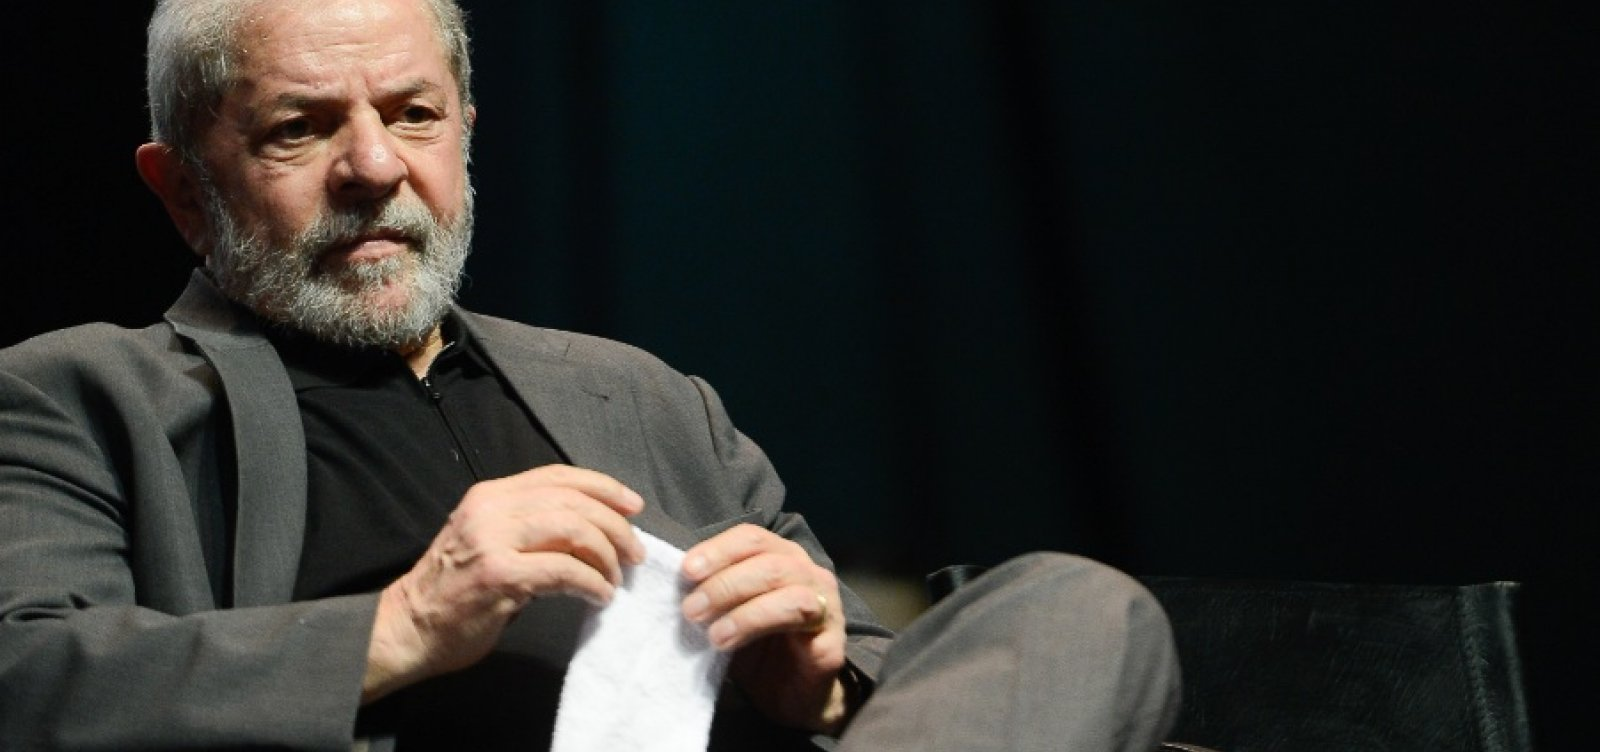 [Pedido de Lula para autorizar vídeos em apoio a Haddad é negado pelo TSE]